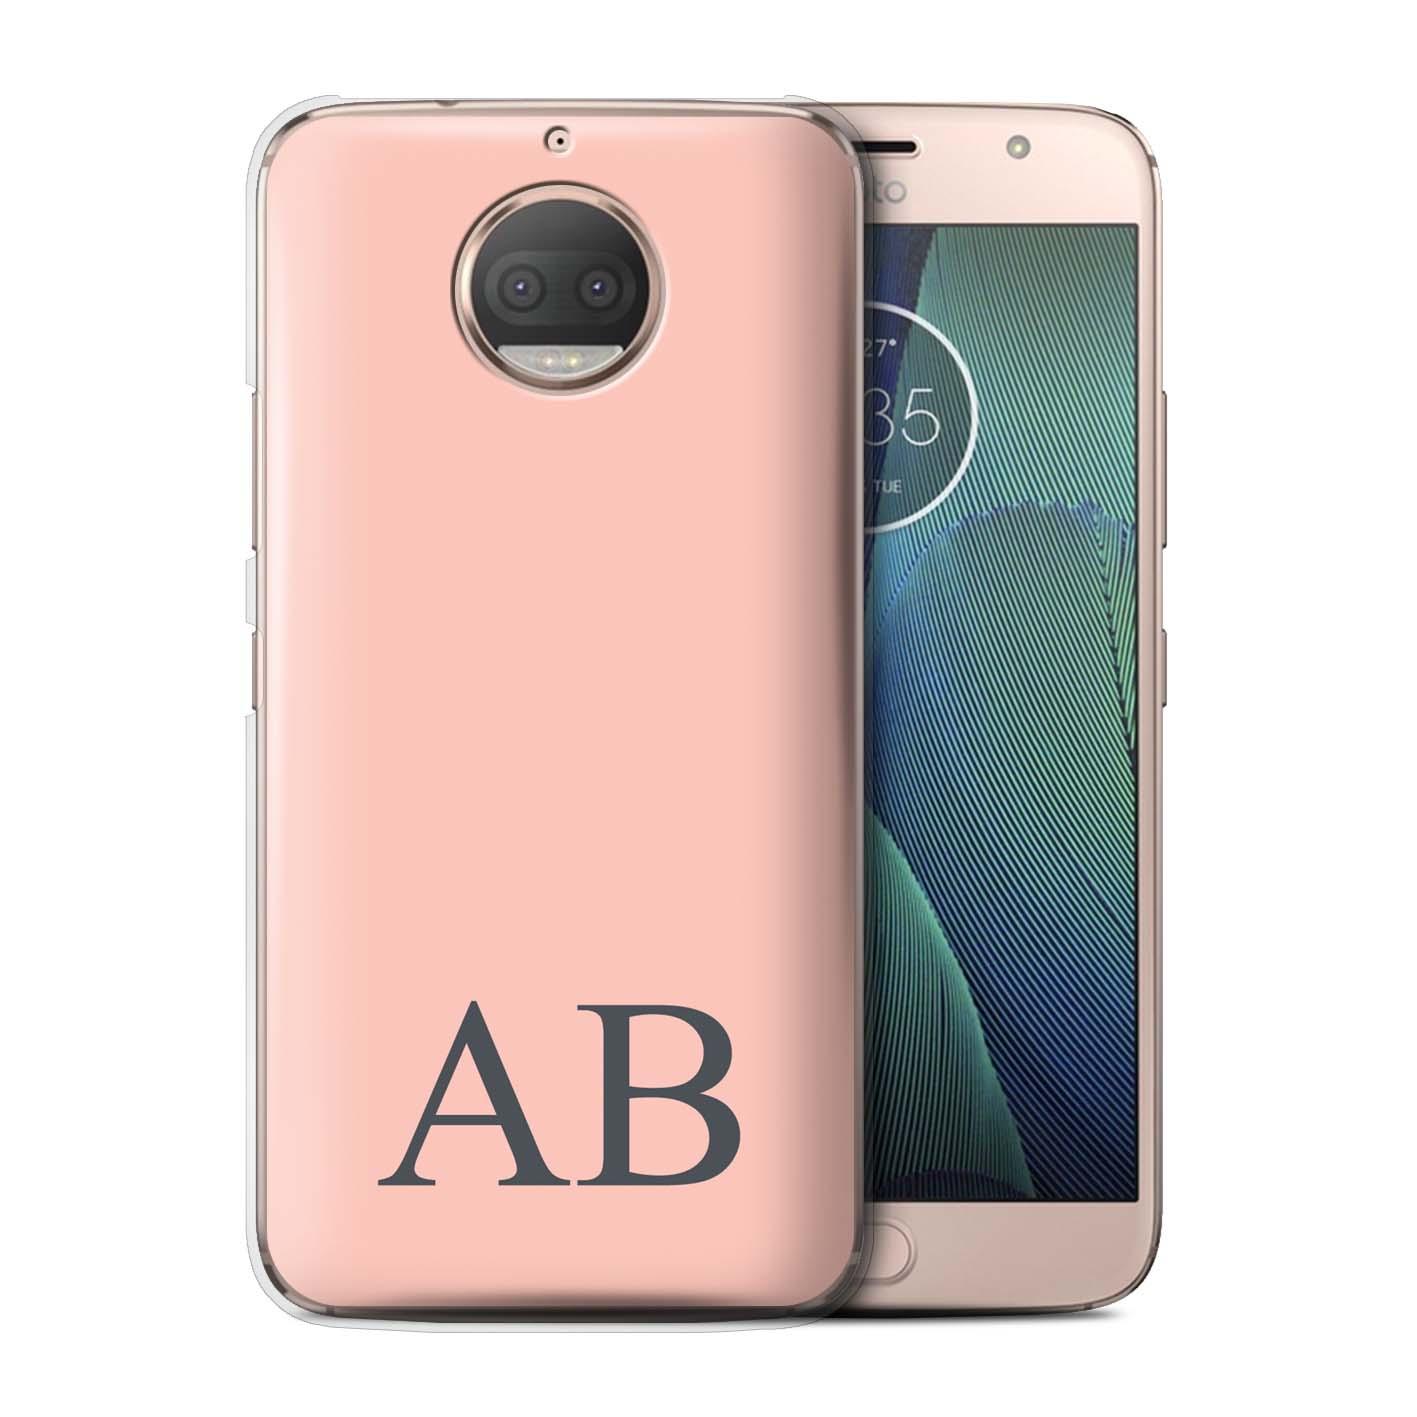 Personalisiert-Pastell-Monogramm-Huelle-fuer-Motorola-Moto-G5S-Plus-Initiale-Case